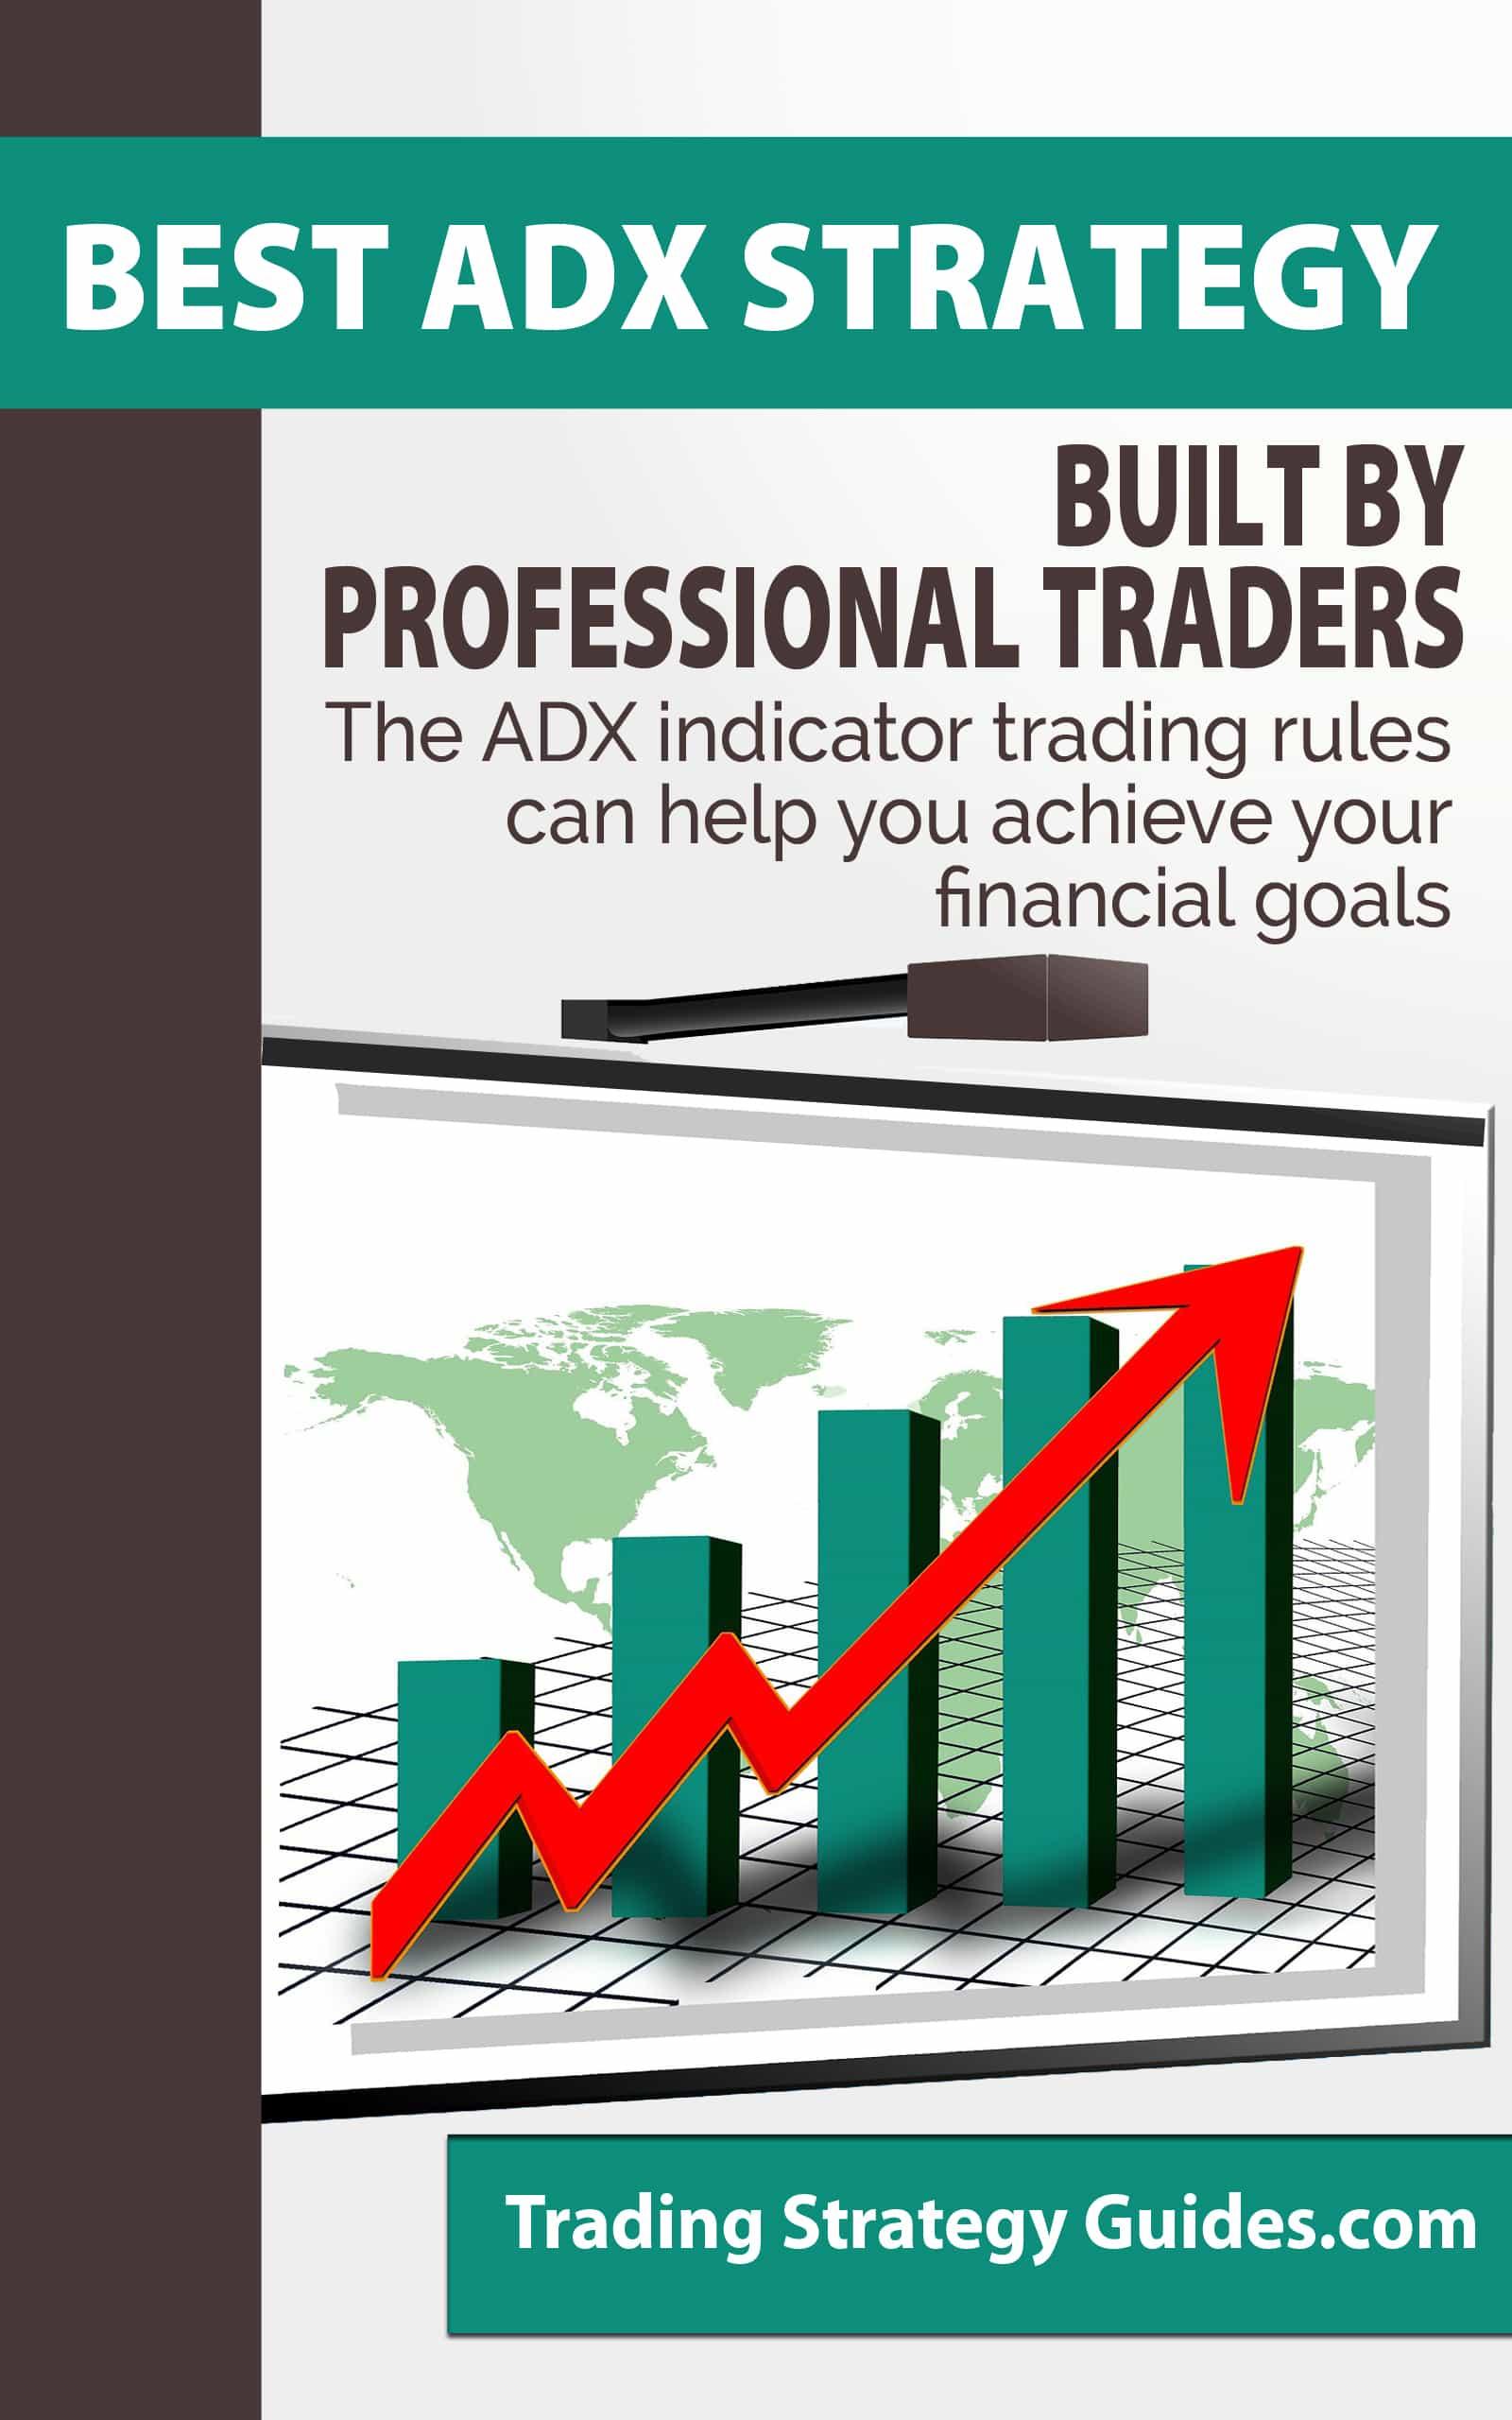 Pro trading indicators